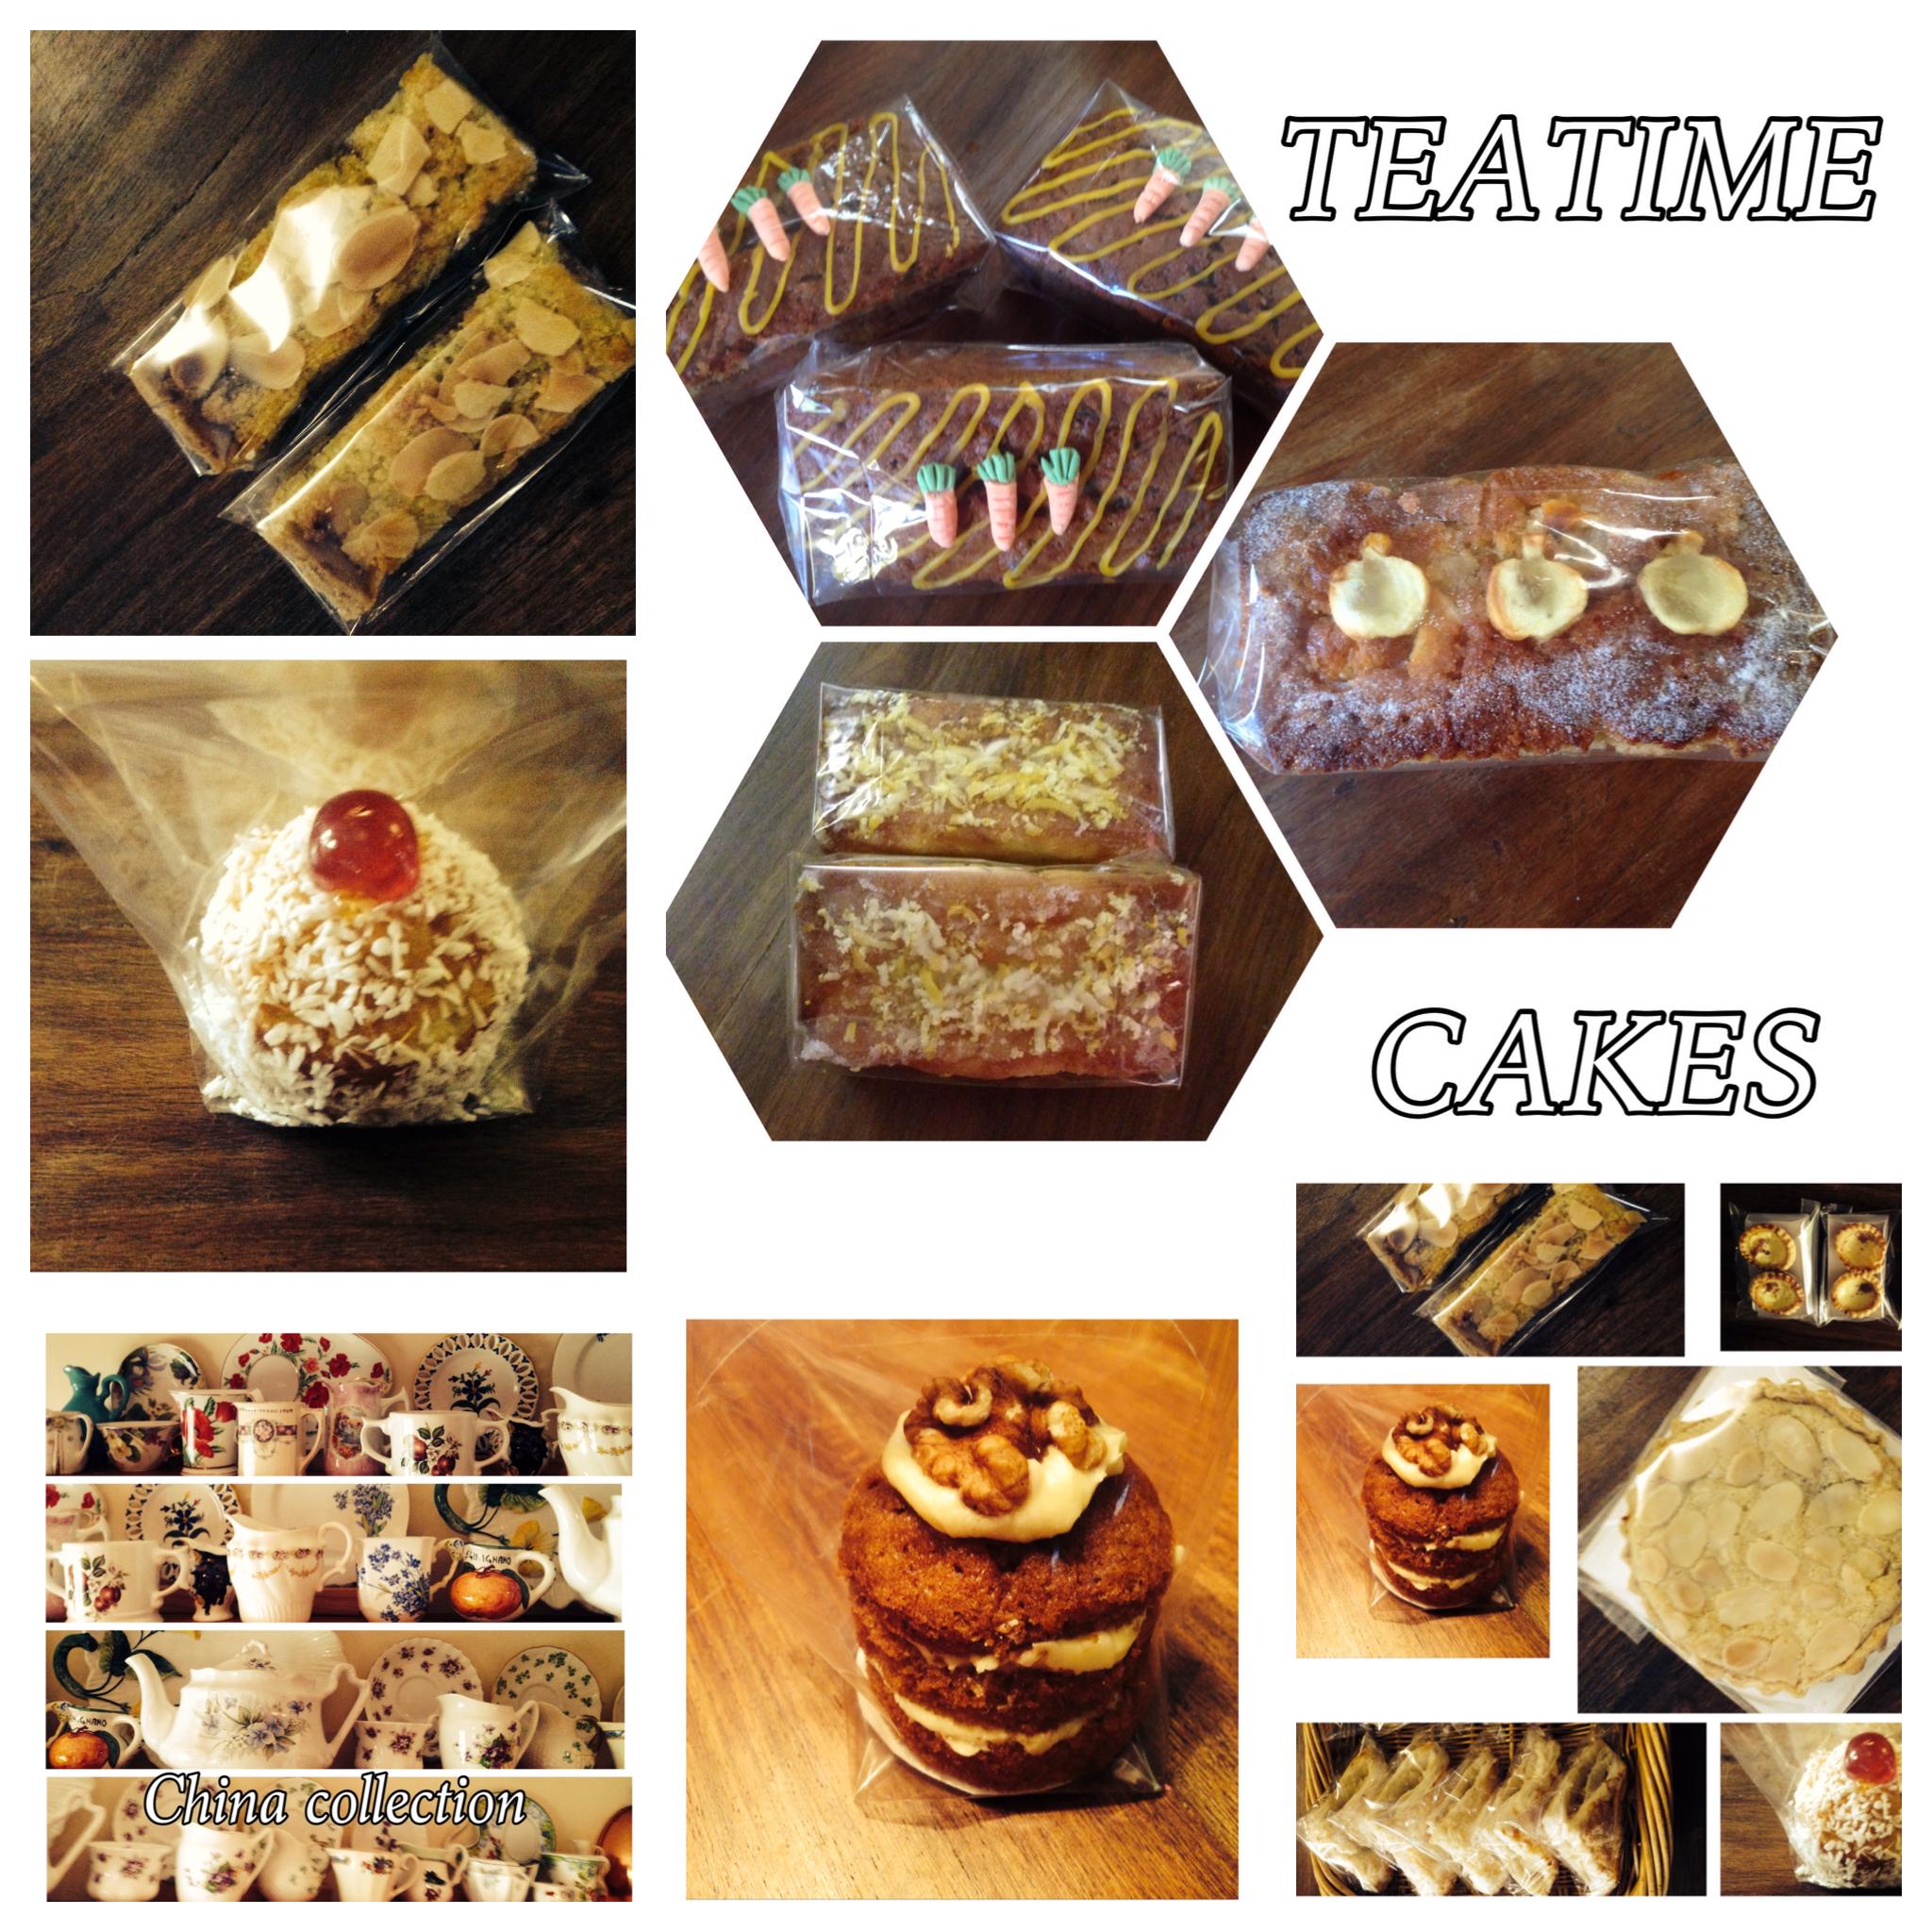 Tea-time Cakes